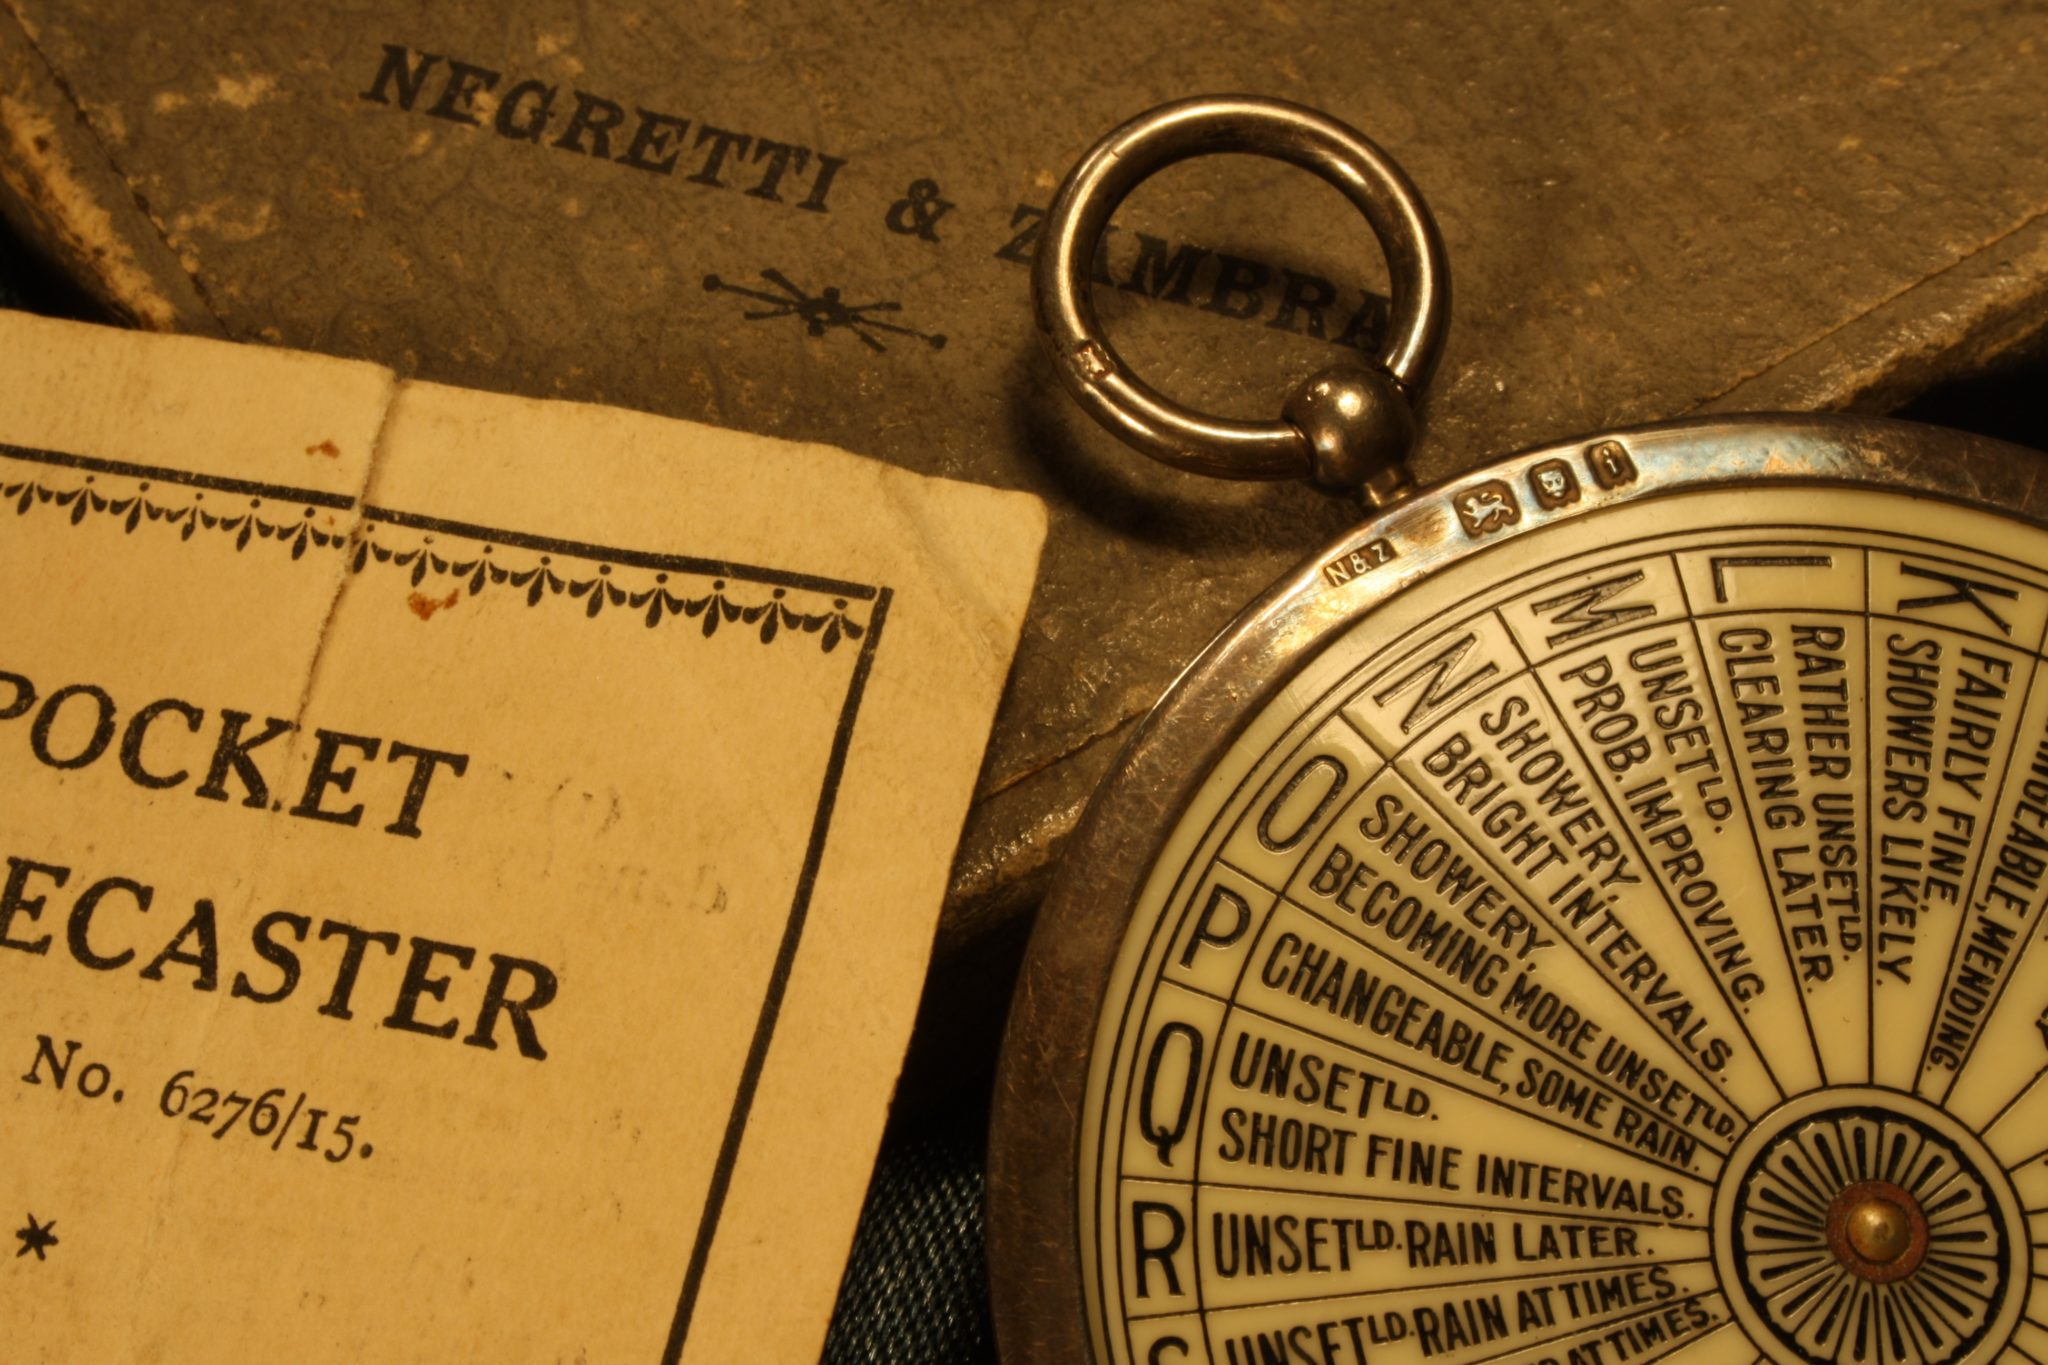 Image of Negretti & Zambra Silver Pocket Forecaster